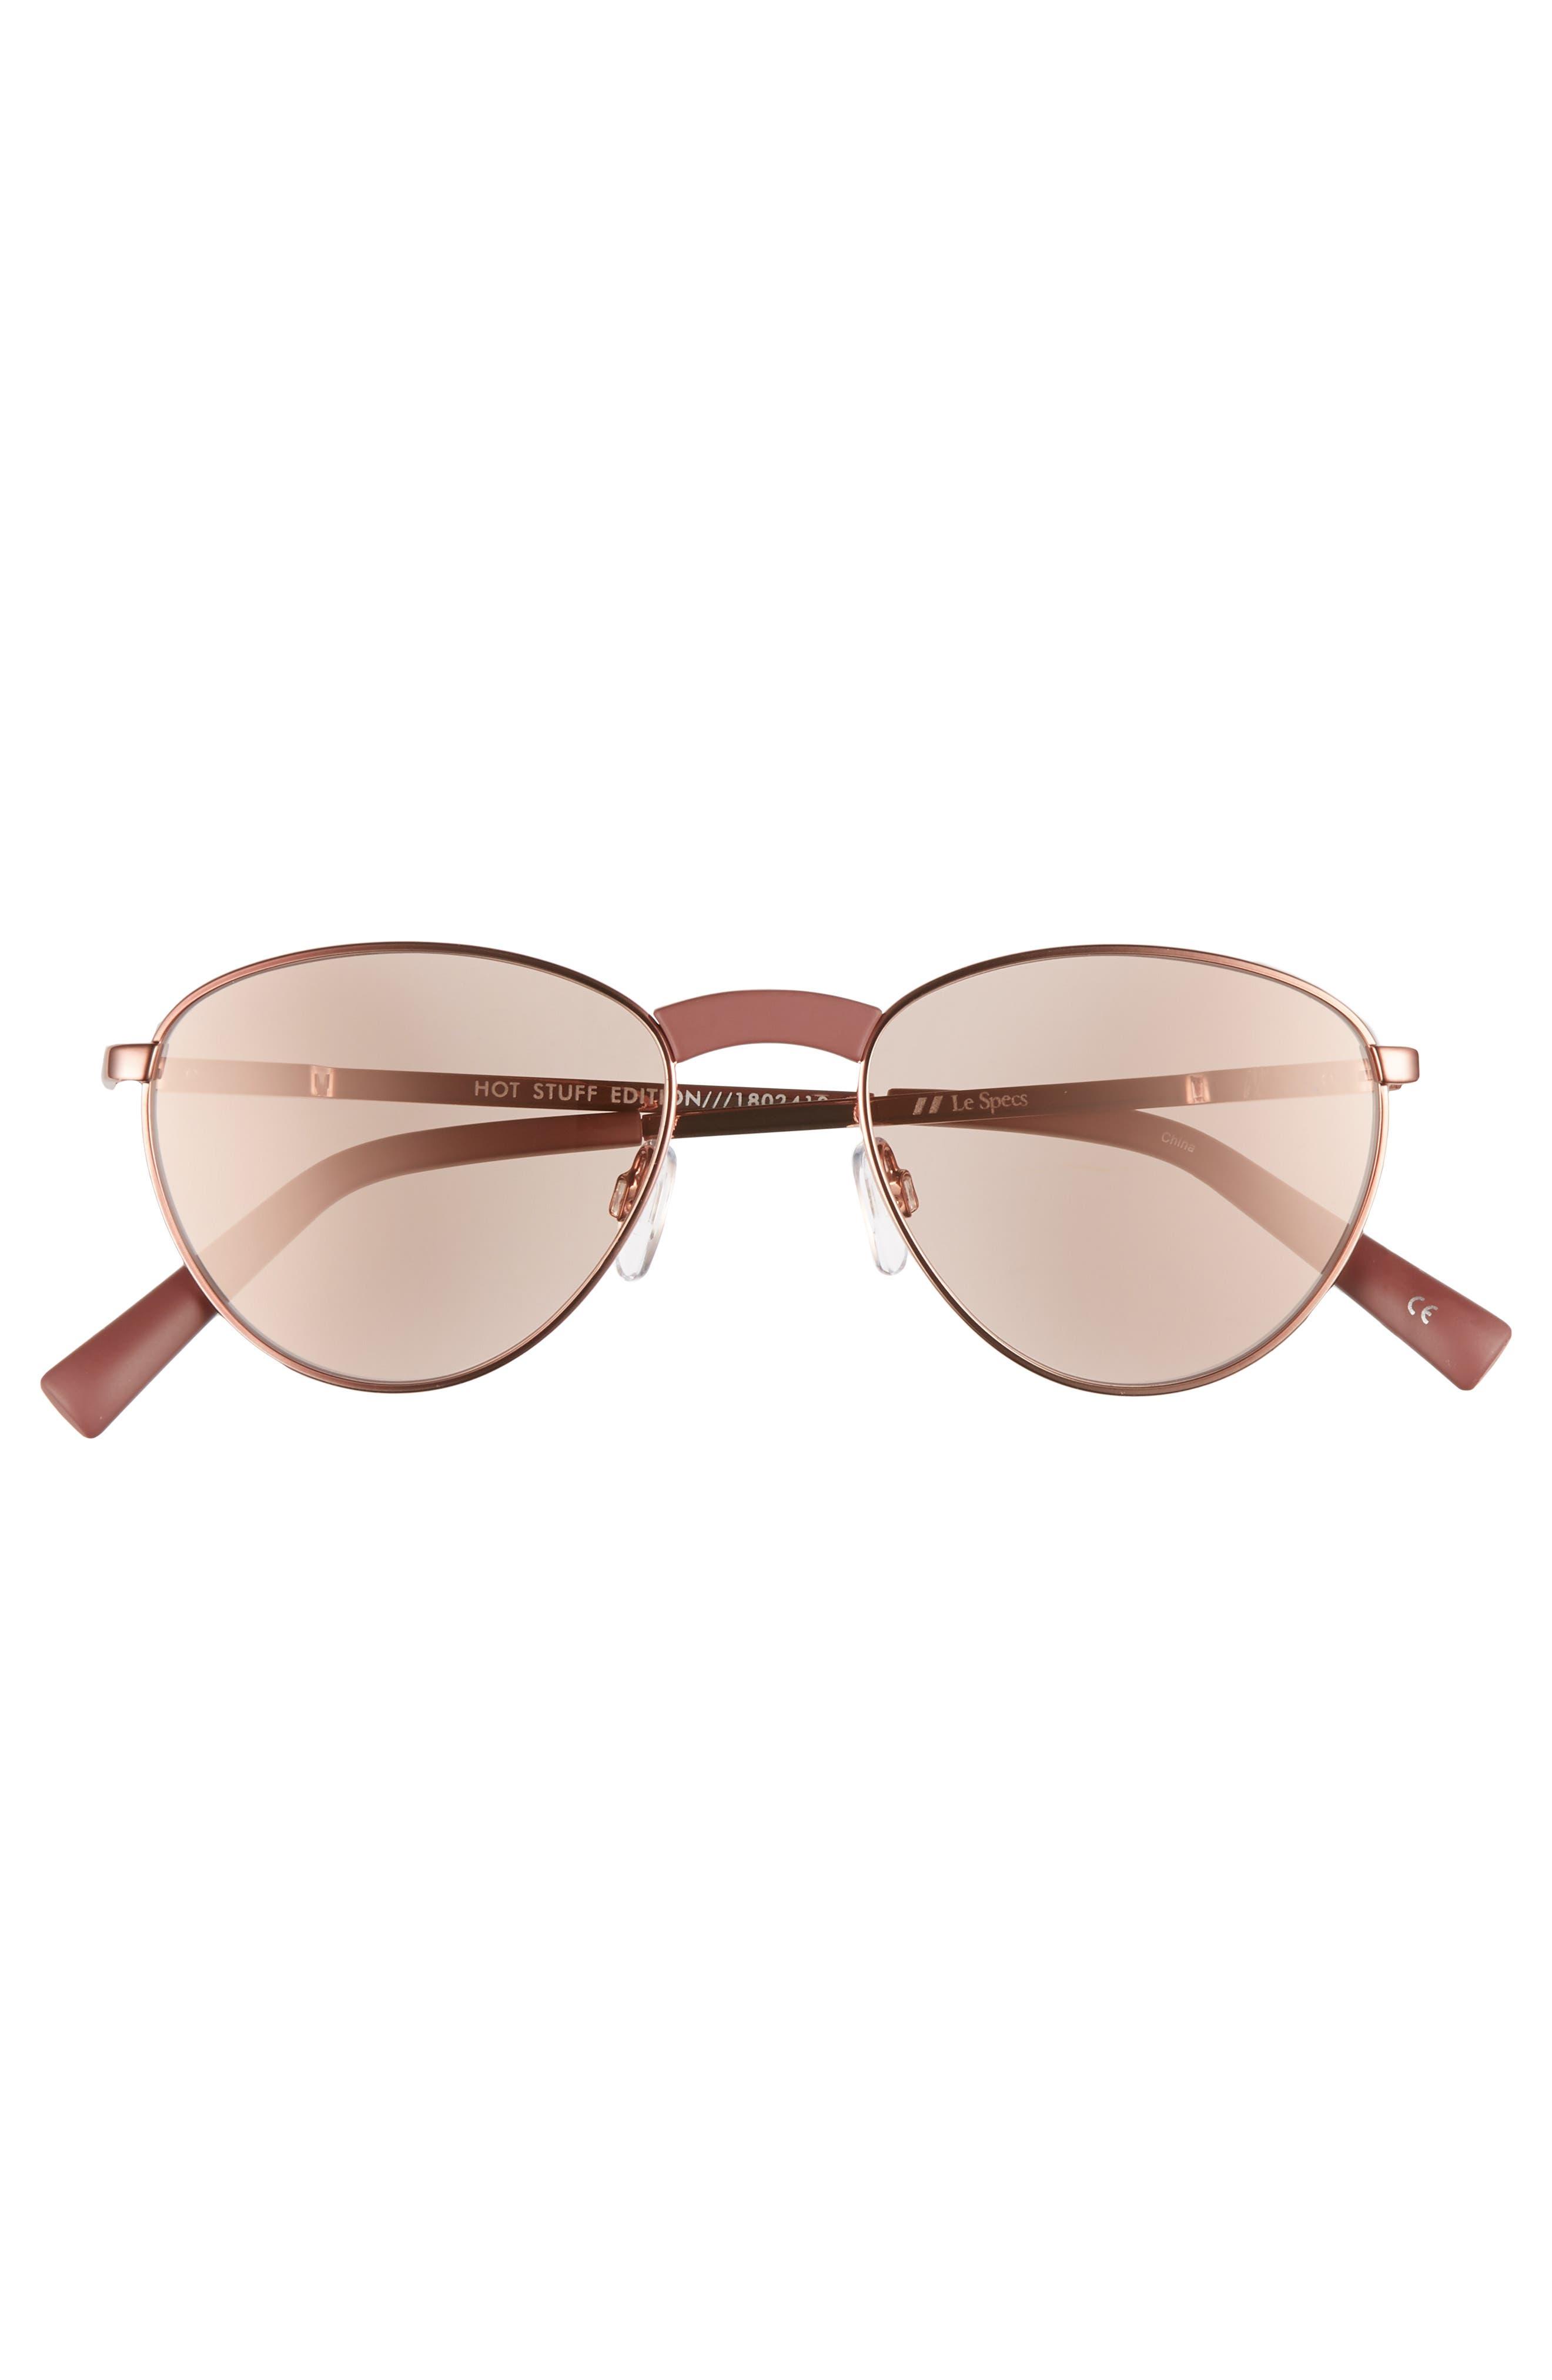 Hot Stuff 52mm Sunglasses,                             Alternate thumbnail 3, color,                             200